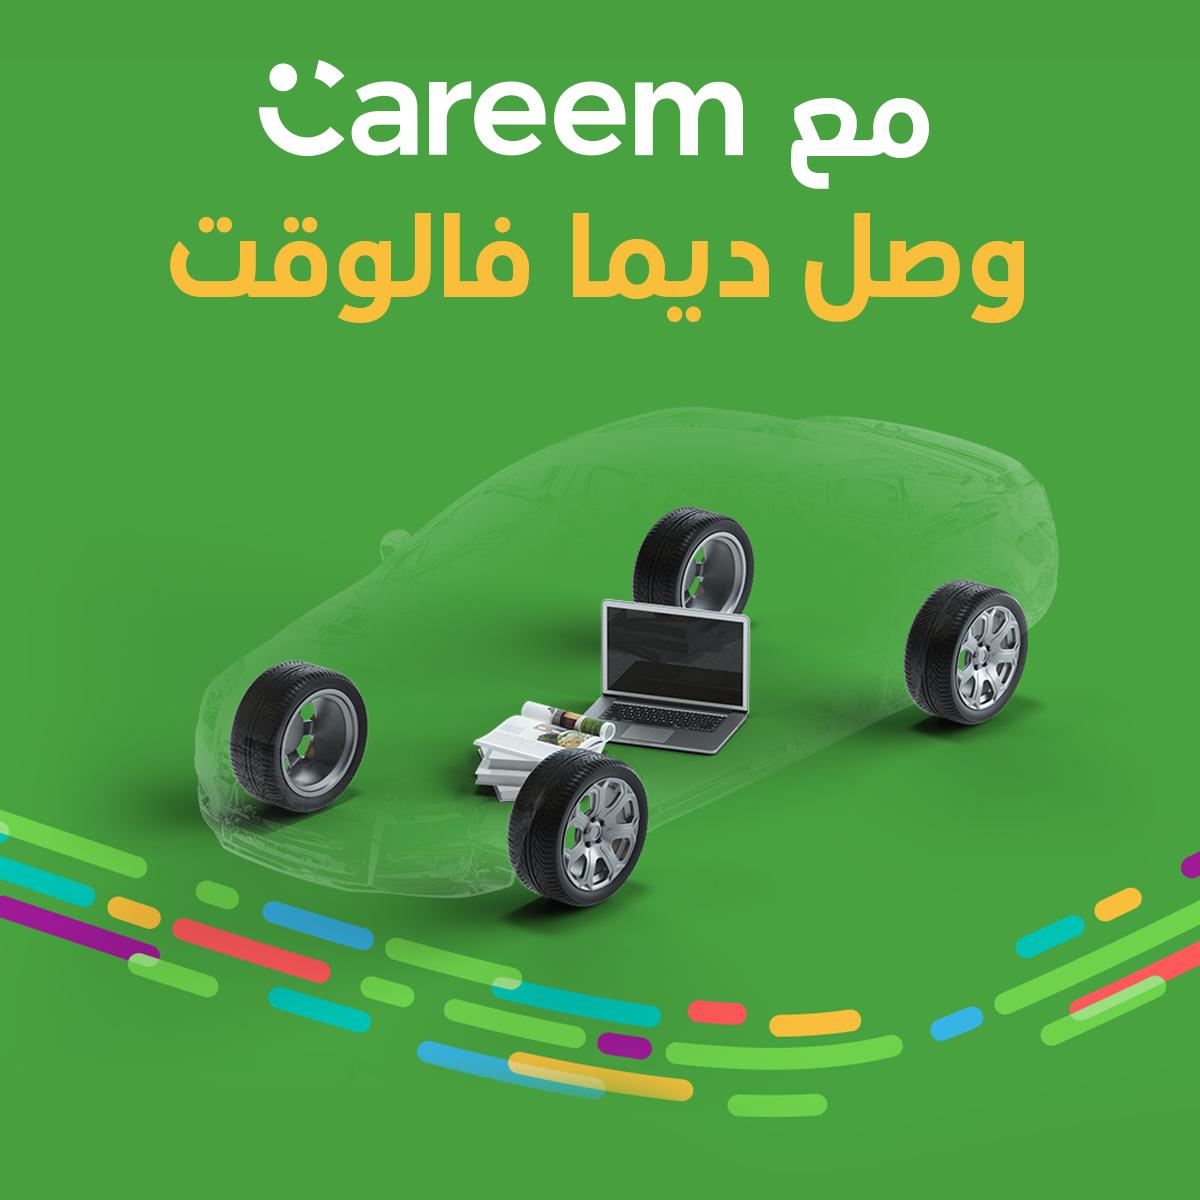 Careem-30